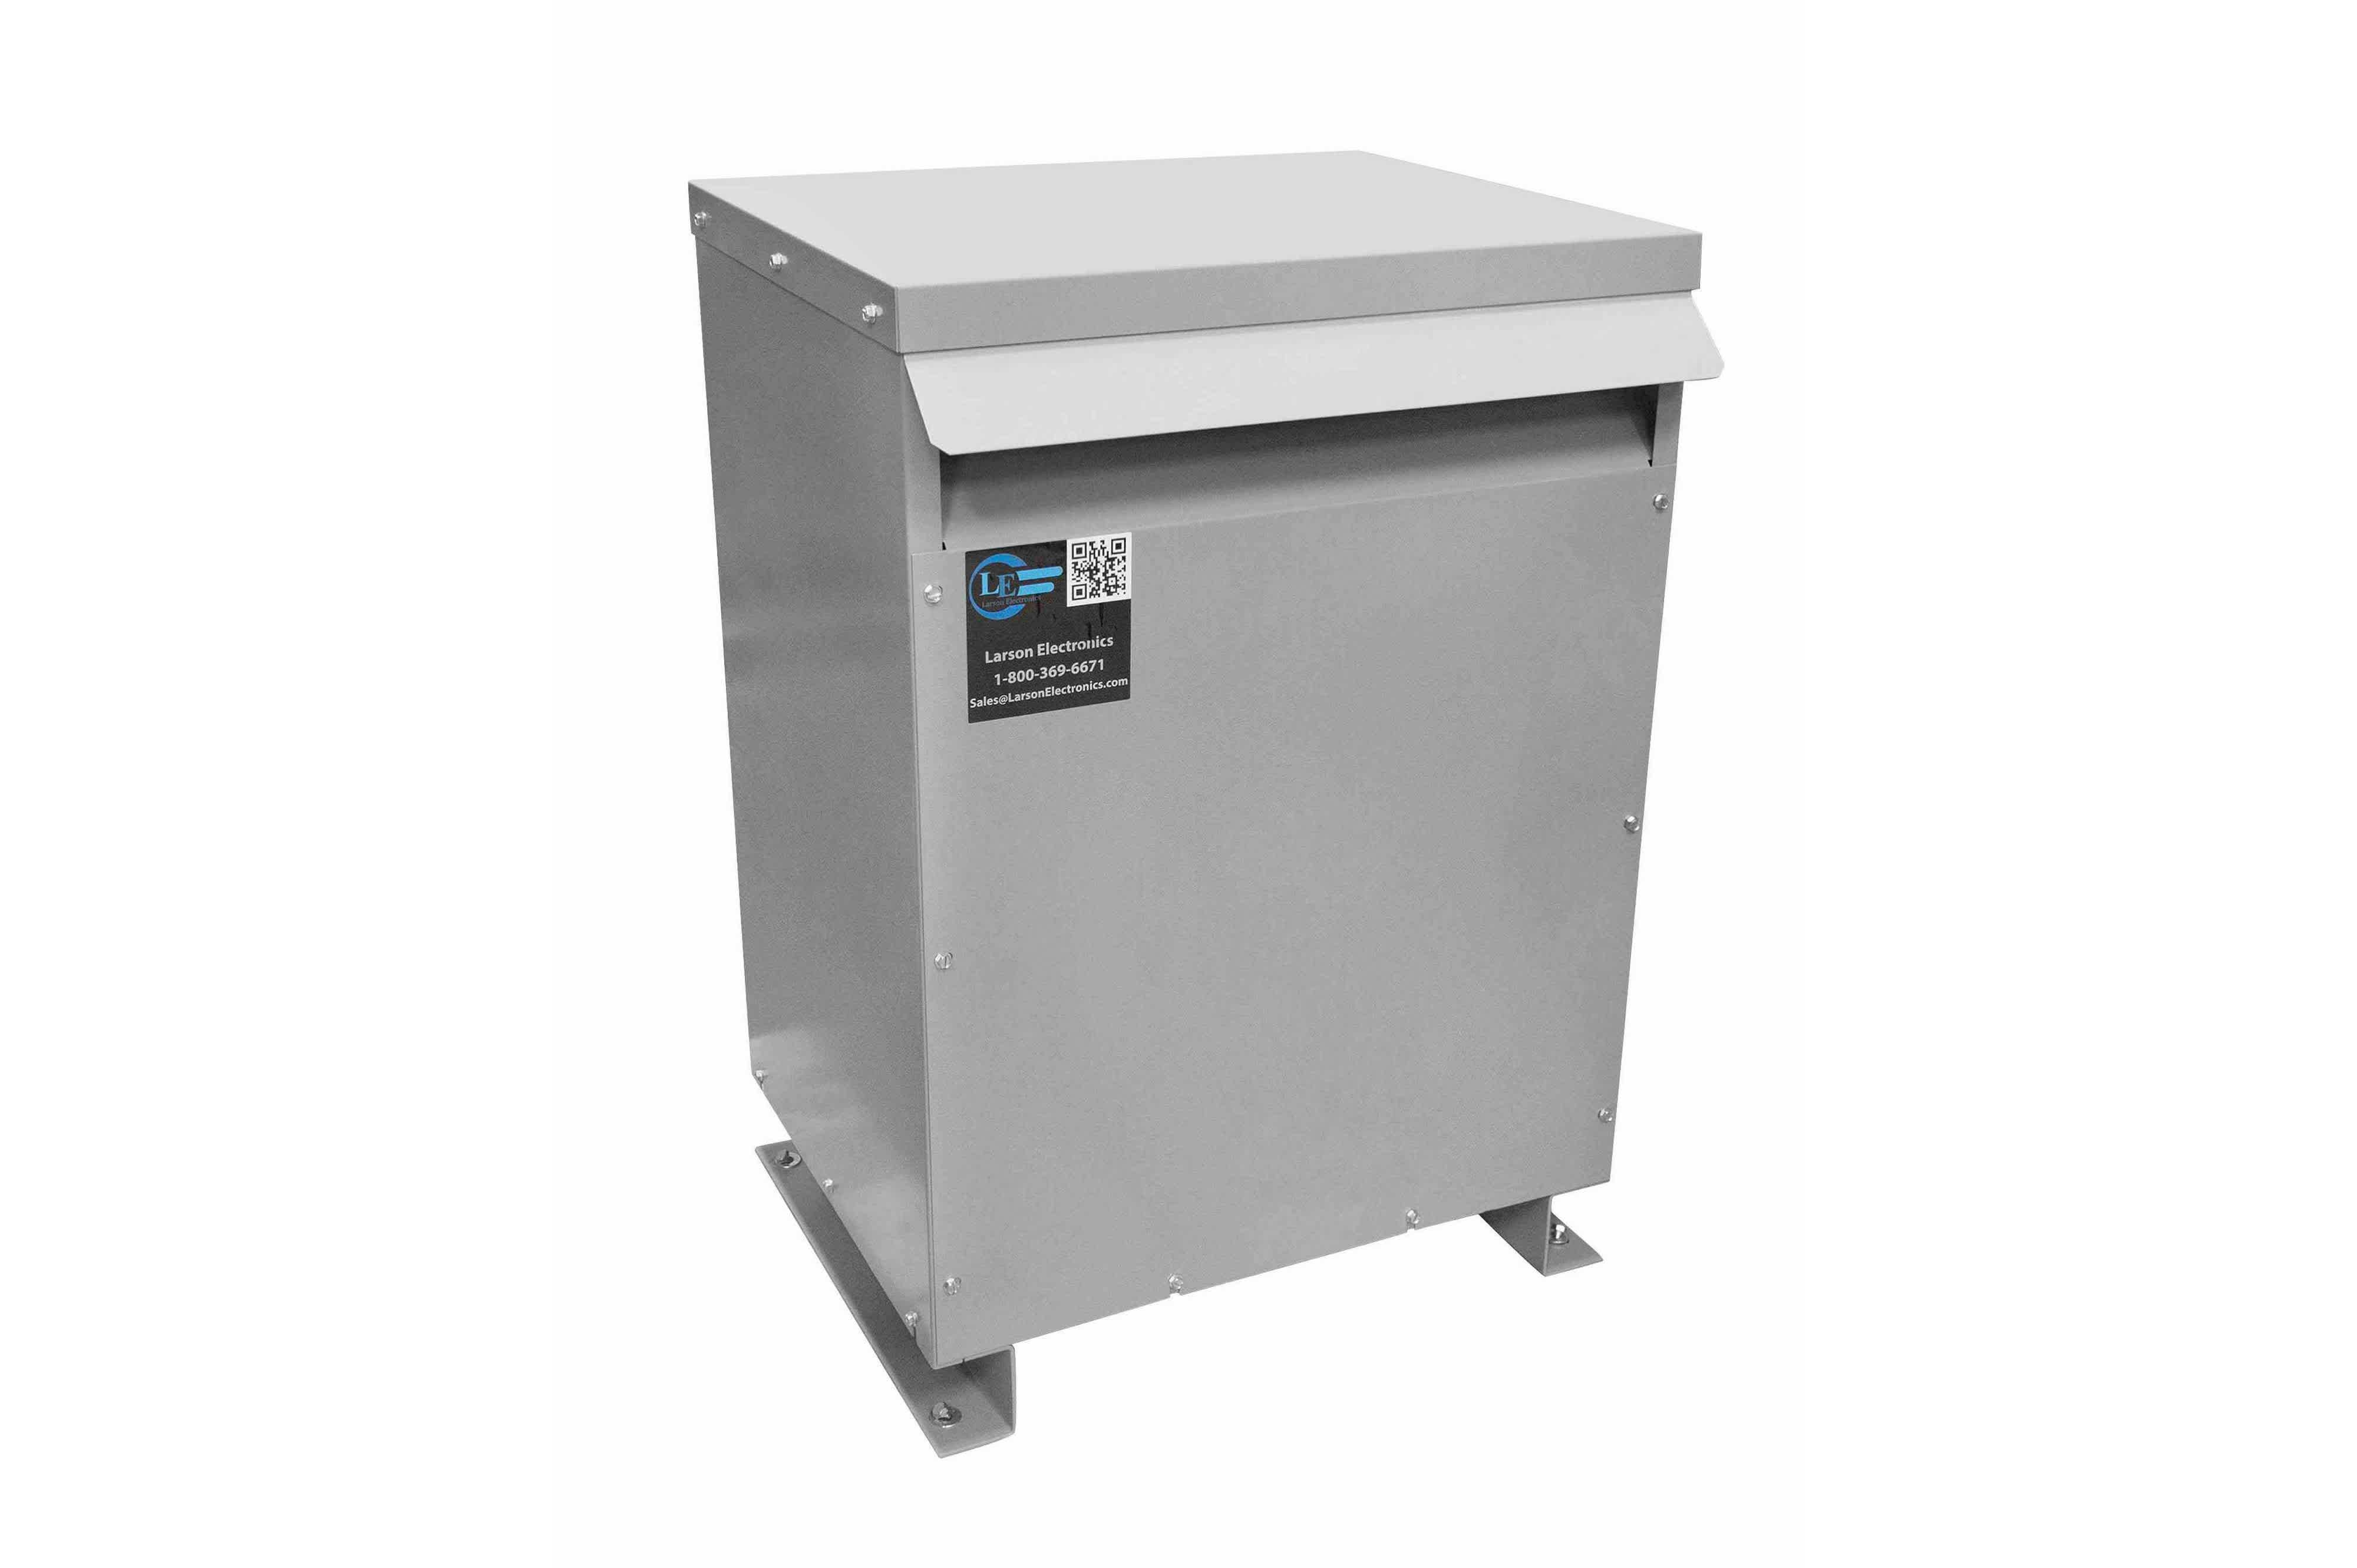 70 kVA 3PH Isolation Transformer, 480V Wye Primary, 240V Delta Secondary, N3R, Ventilated, 60 Hz